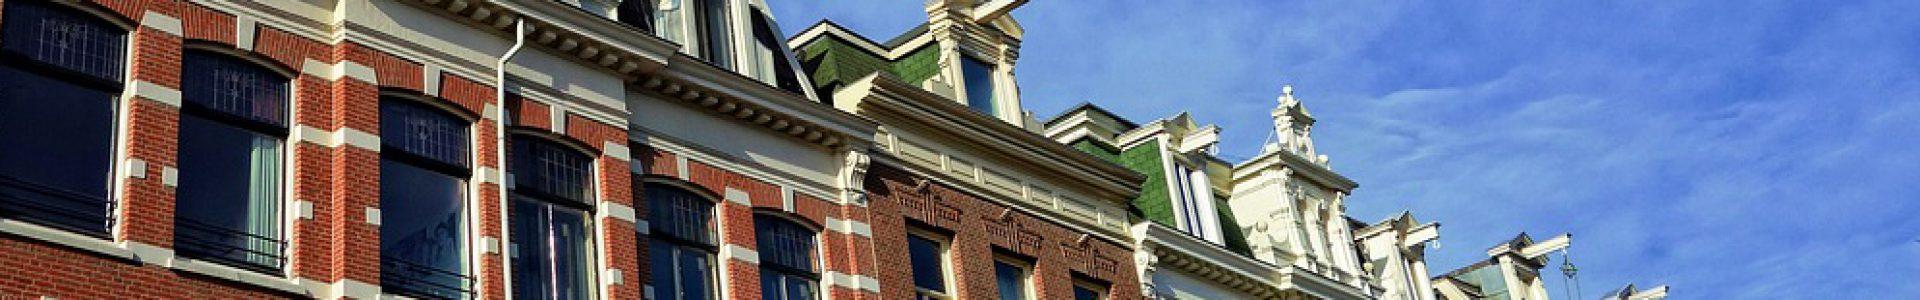 Amsterdam-bronneberg-beveiliging-security3